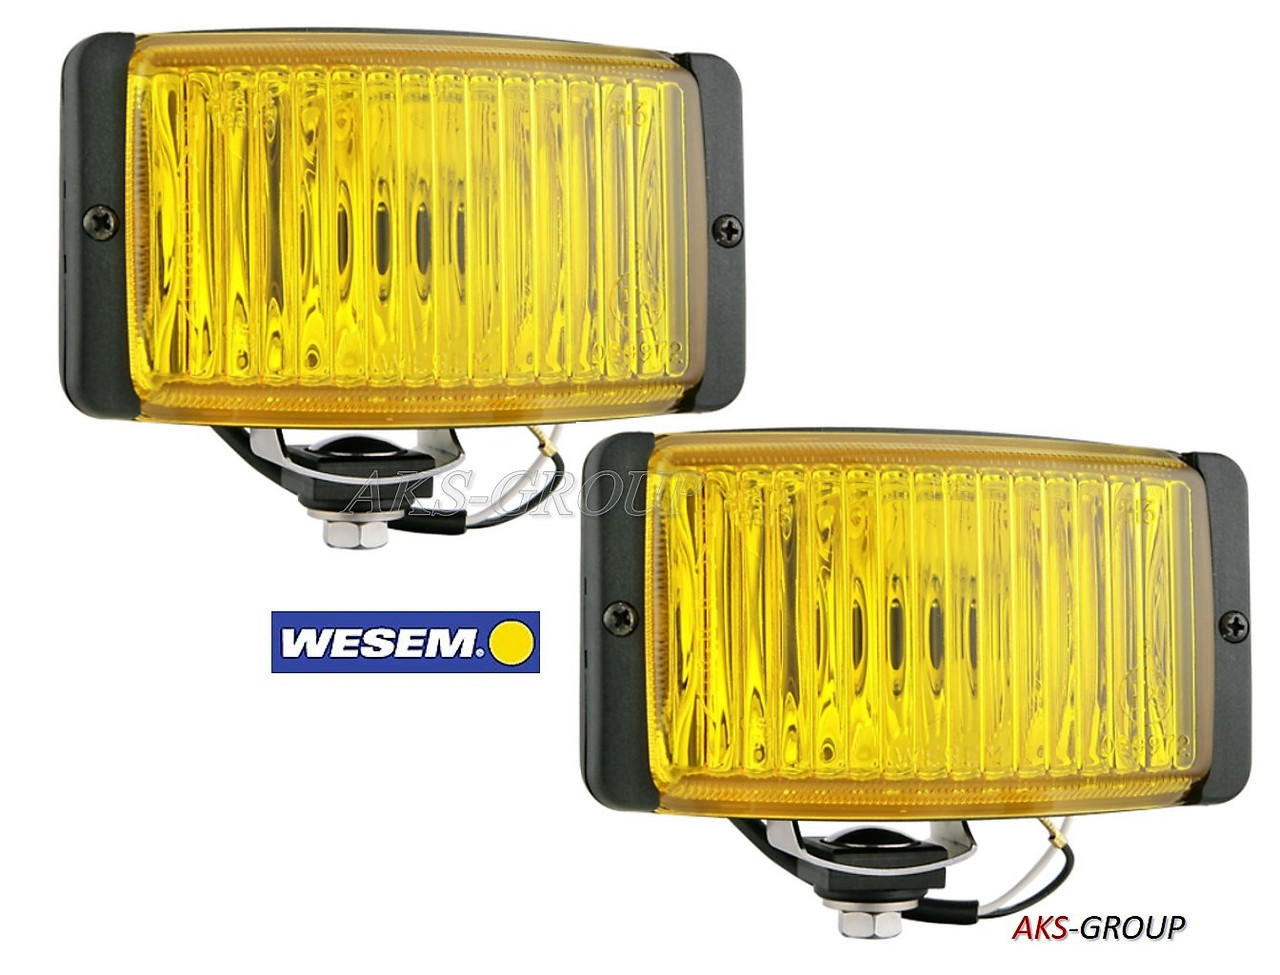 Противотуманные фары 138x78x68мм Wesem HM2.19973 галогенные желтые